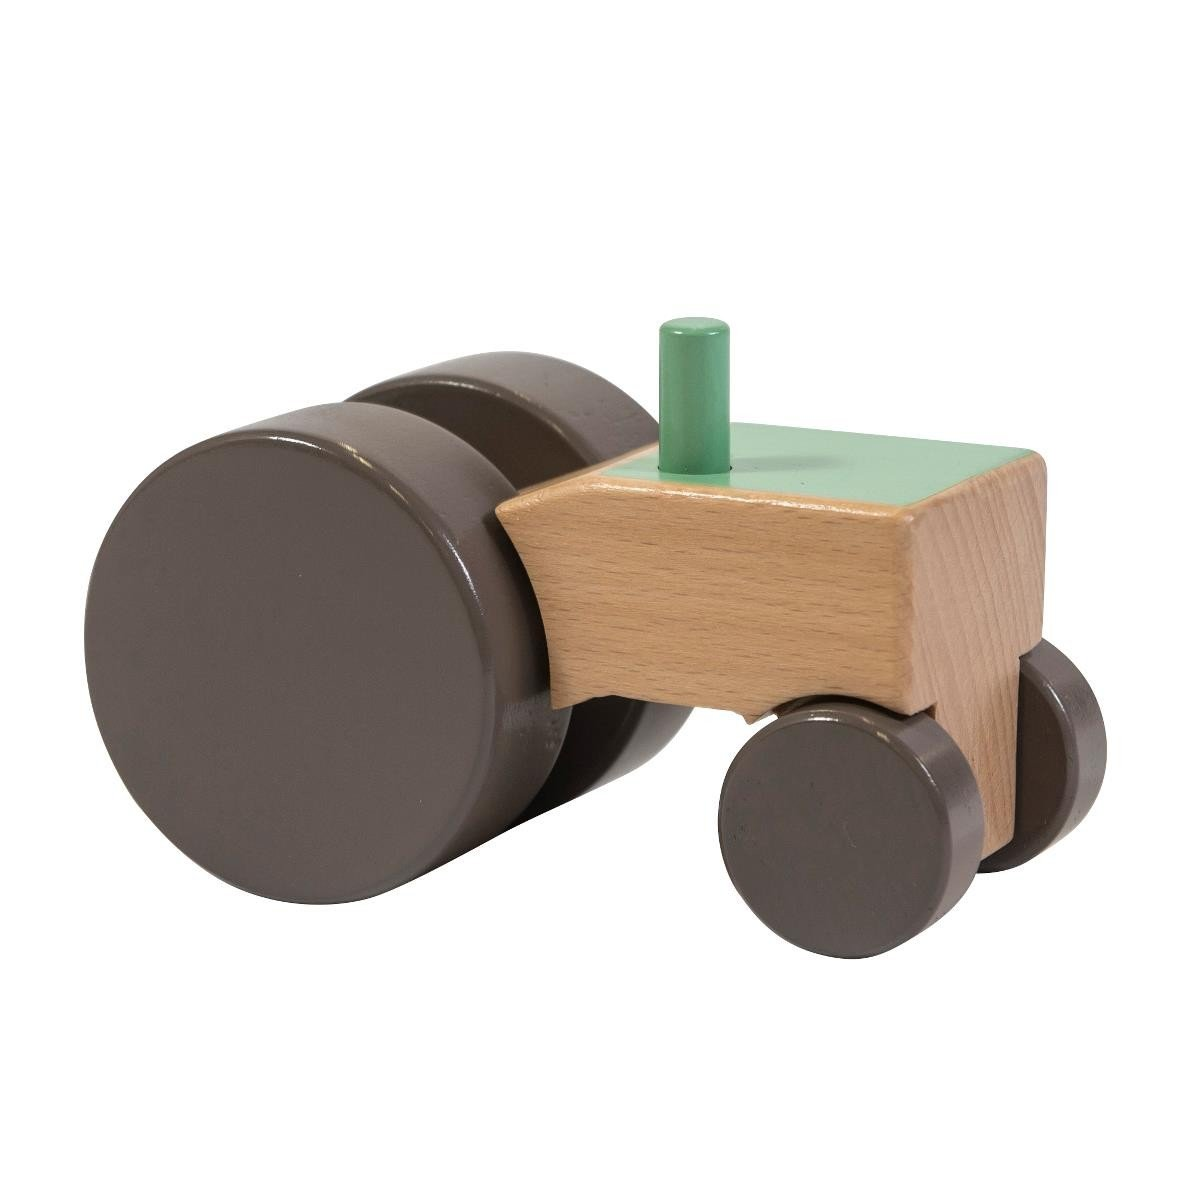 traktor aus holz gr n spielzeugtraktor aus holz von sebra. Black Bedroom Furniture Sets. Home Design Ideas